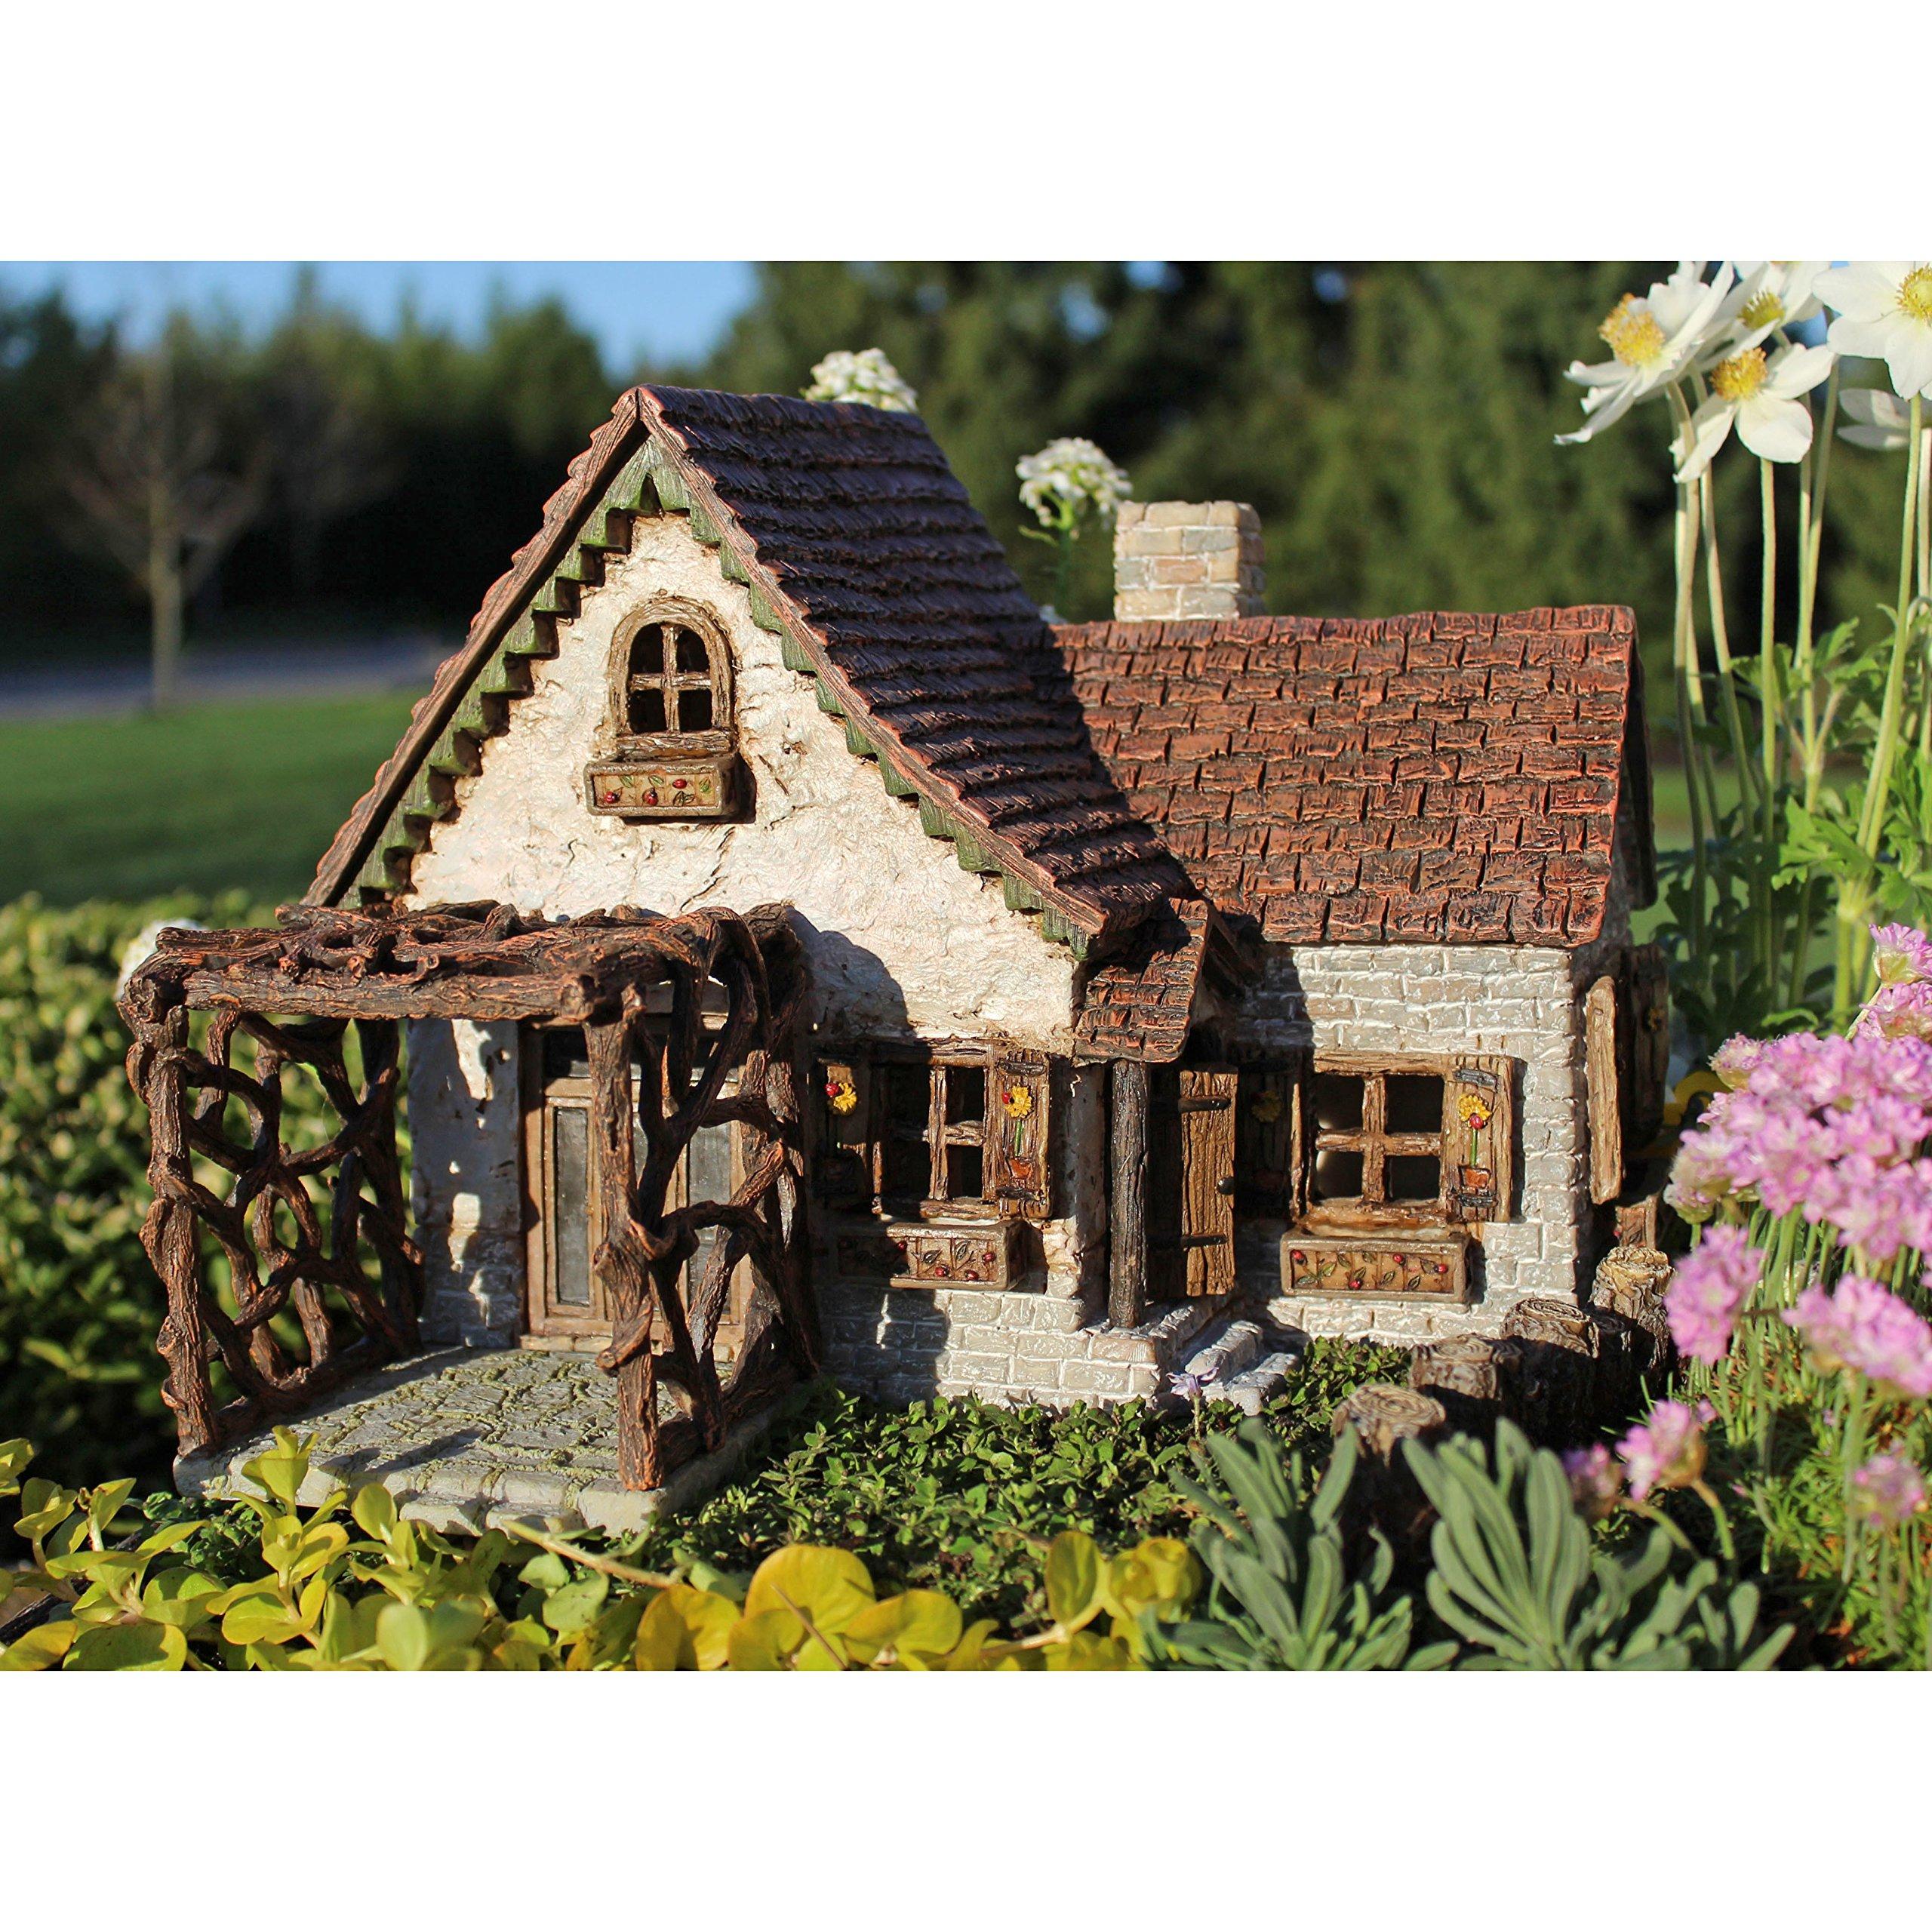 Miniature Fairy Garden Ladybug House